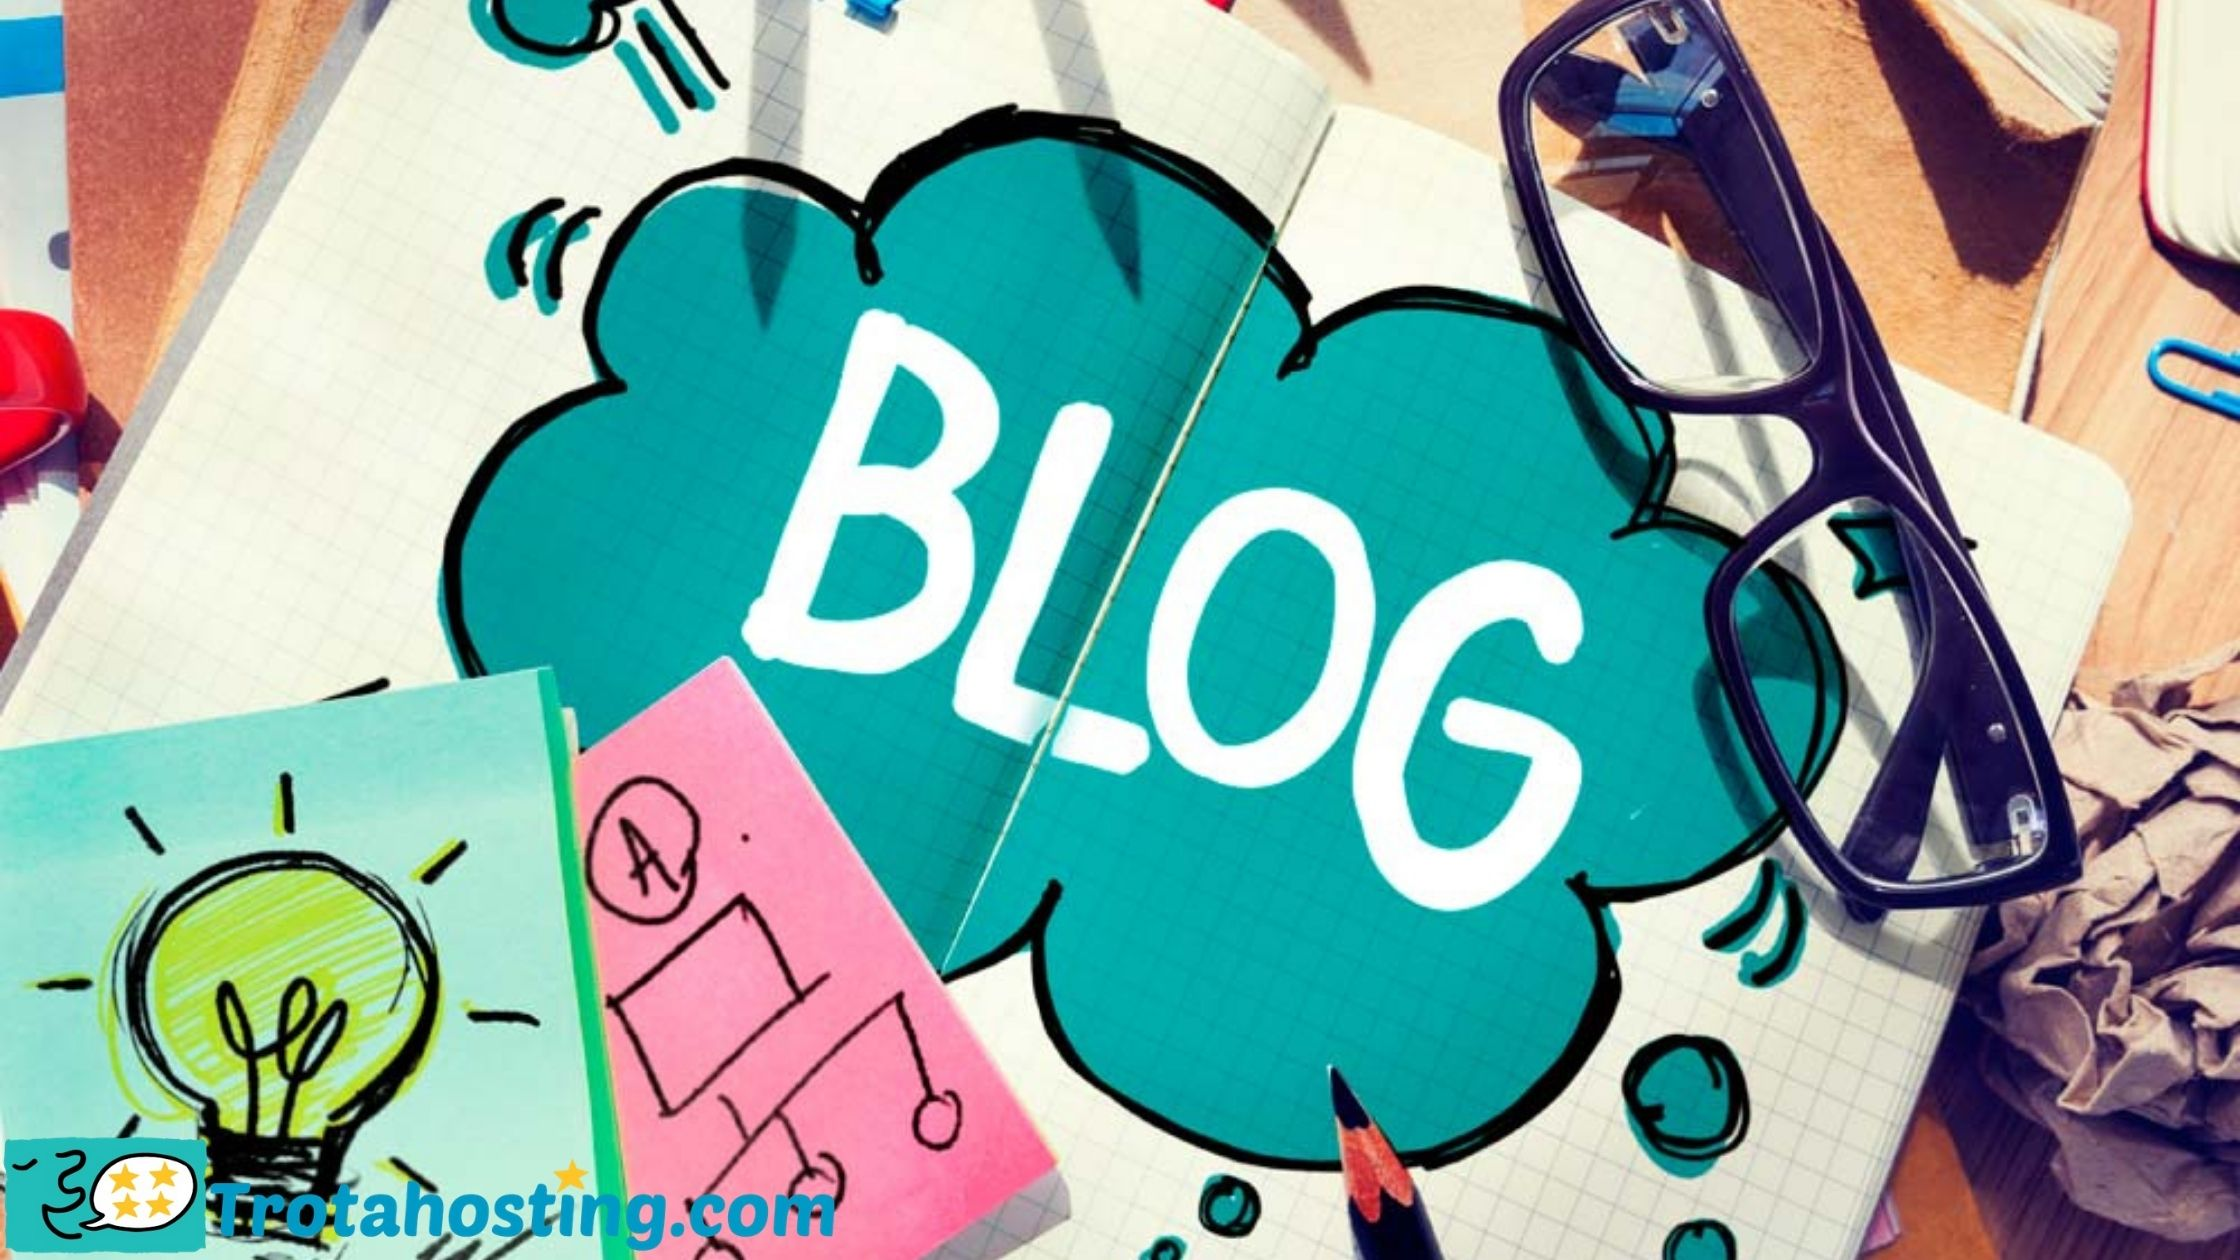 crear un blog en WordPress.com